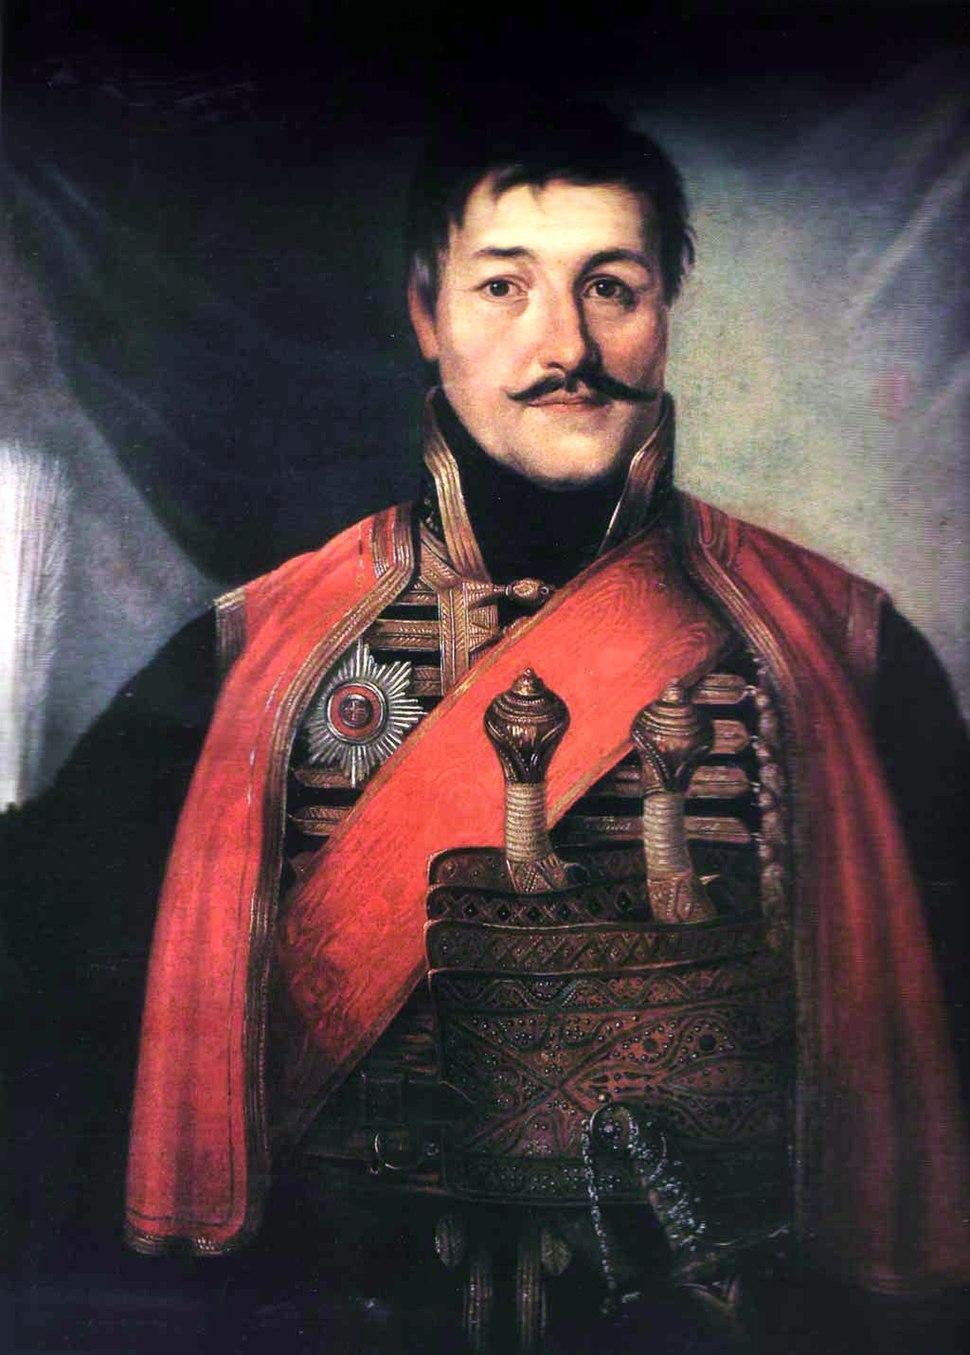 Karađorđe Petrović, by Vladimir Borovikovsky, 1816